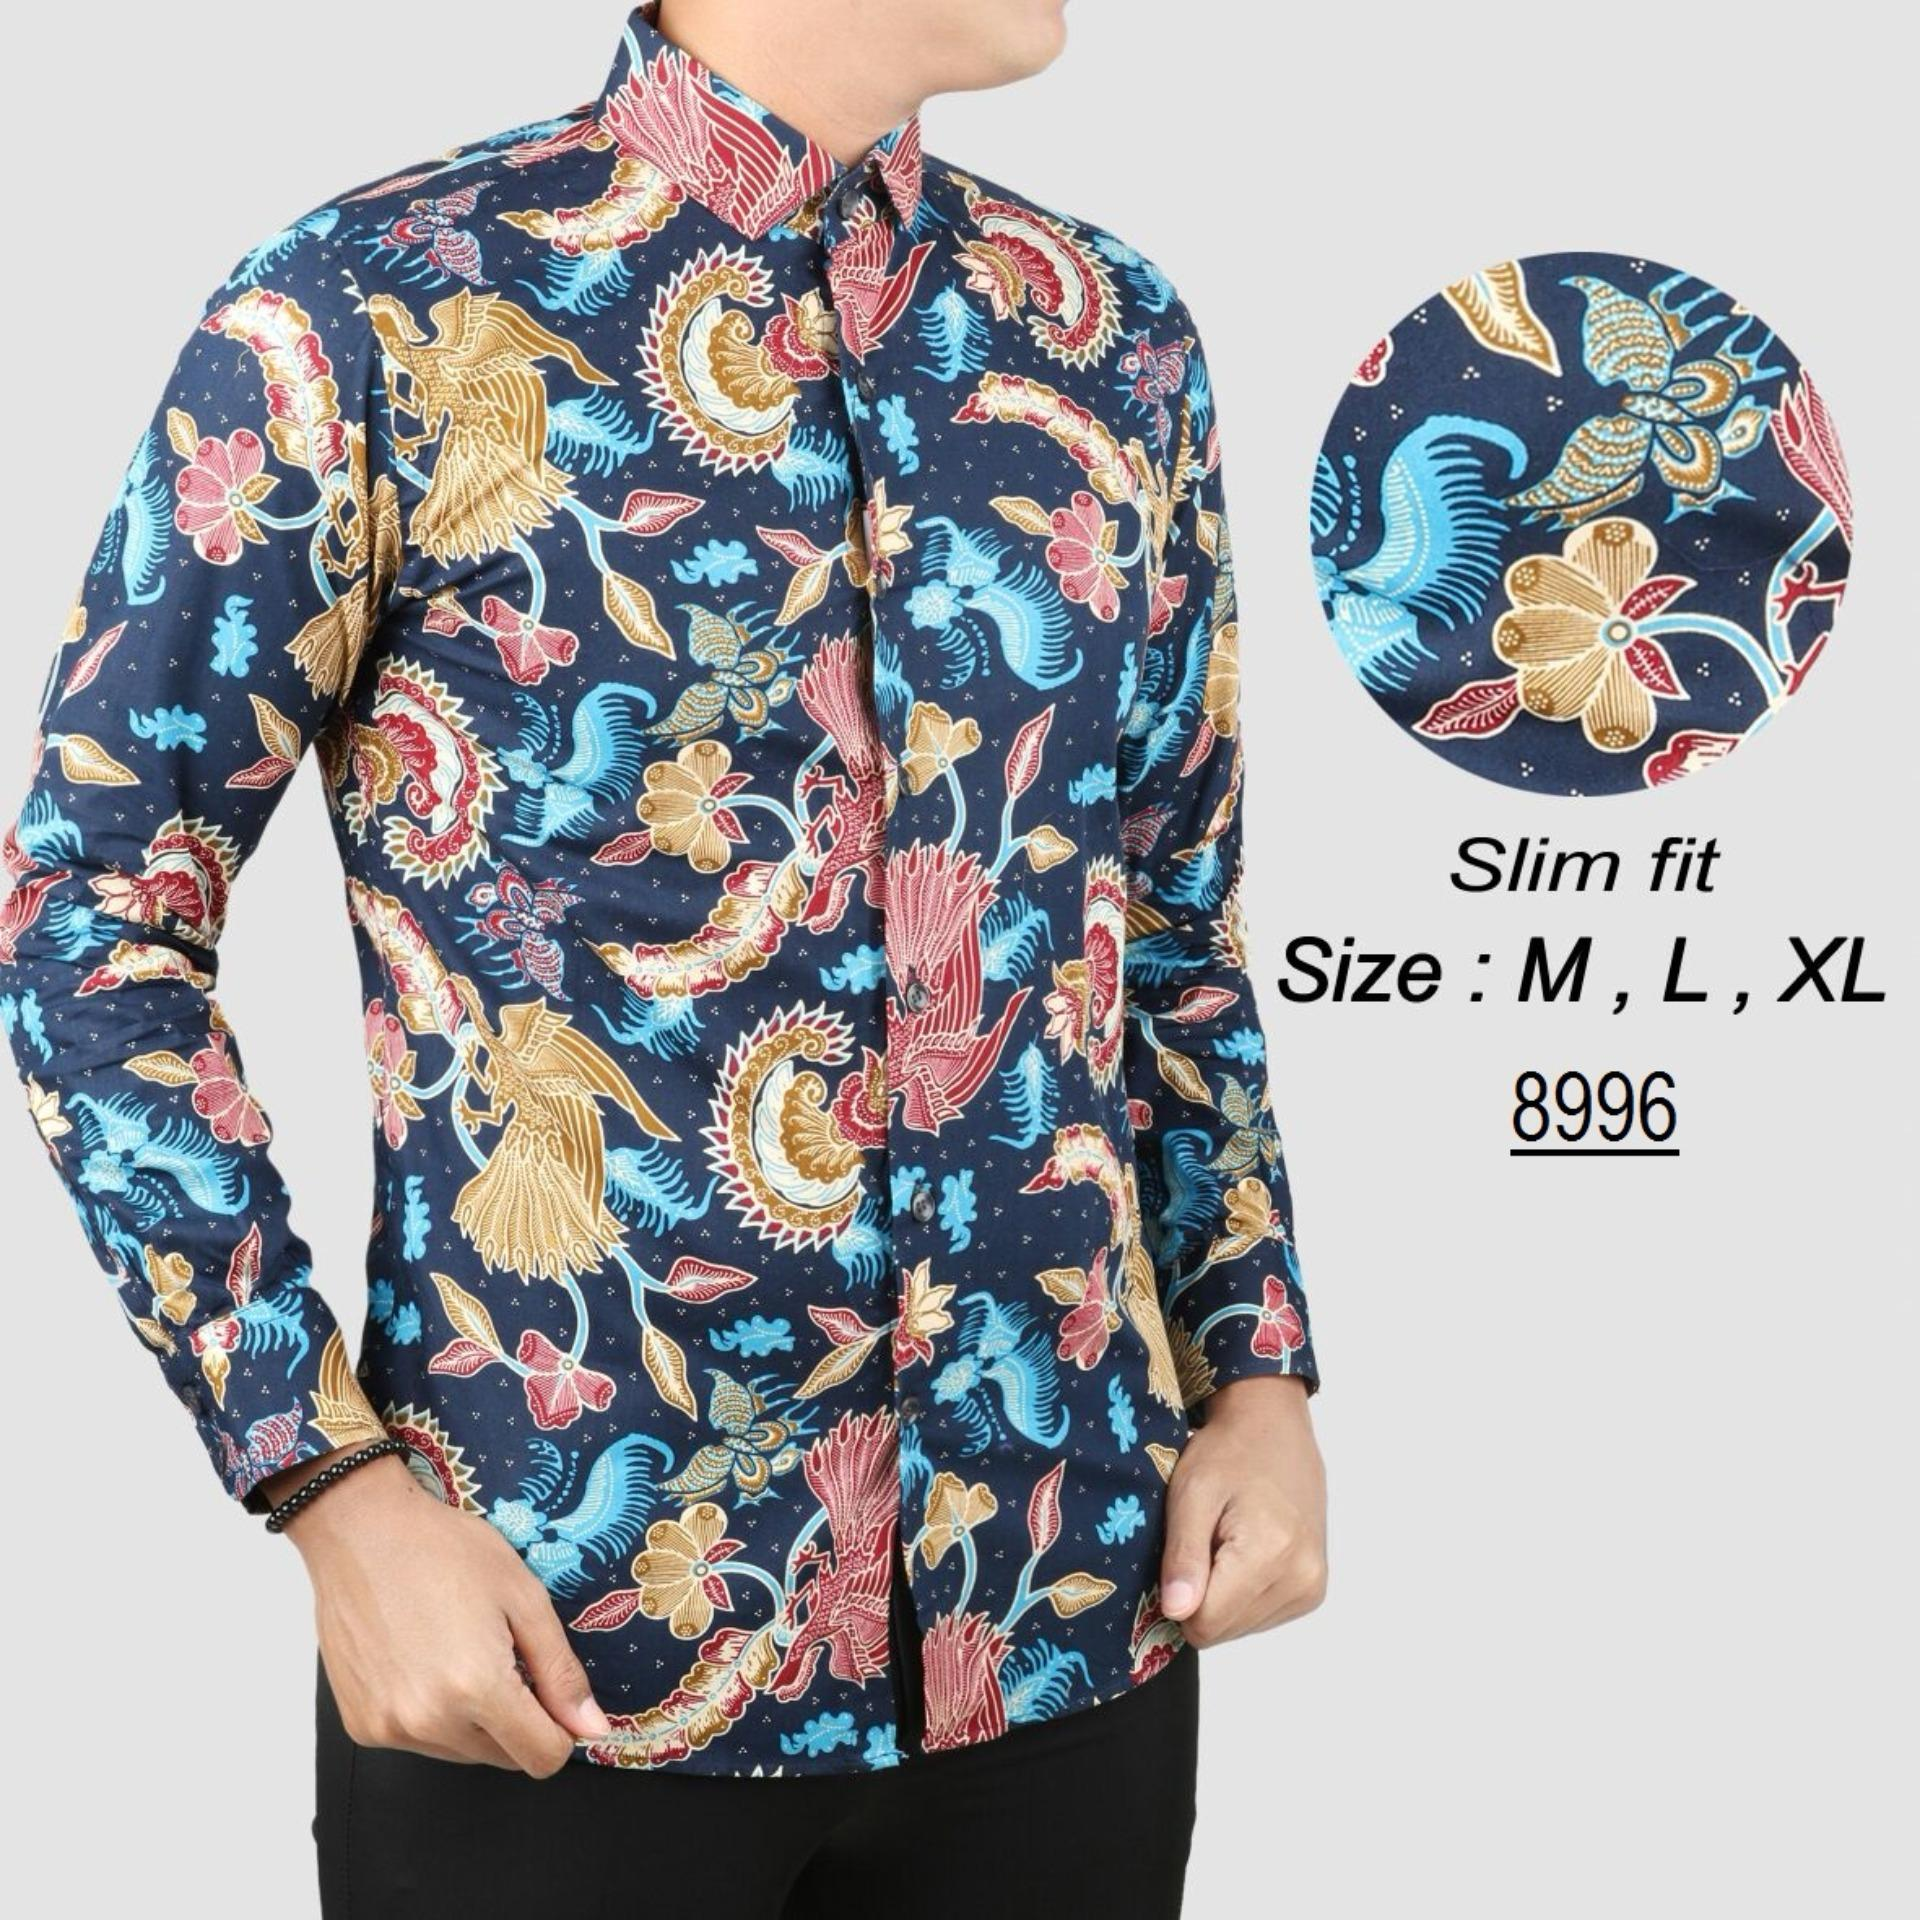 Diskon Baju Batik Modern Kemeja Pria Slim Fit 8996